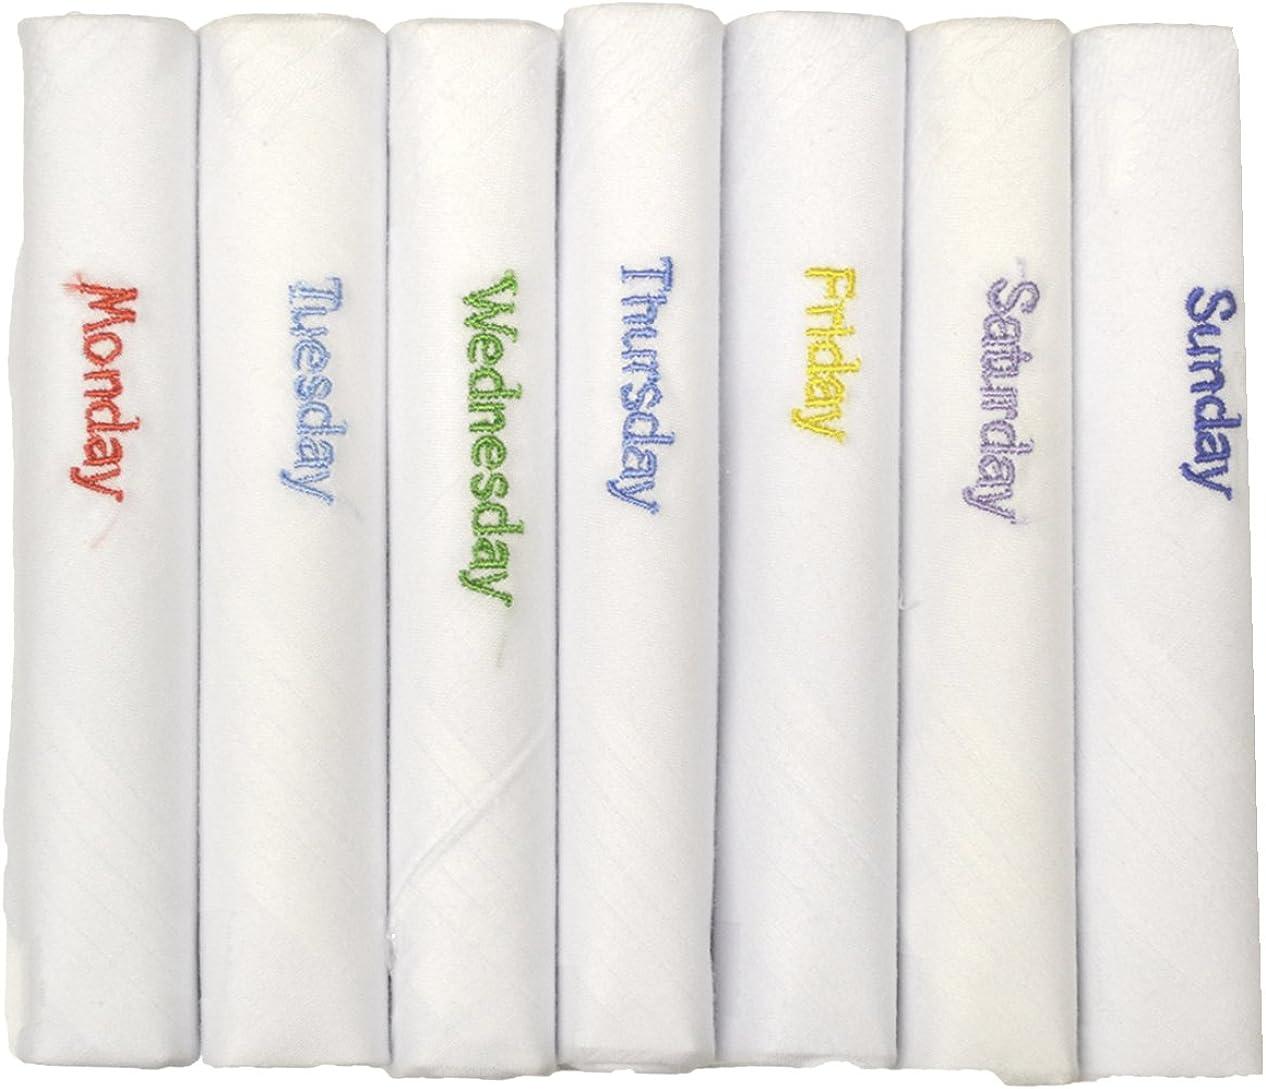 ETHO Set Of 7 100% Pure Cotton Handkerchiefs Days Of The Week Design